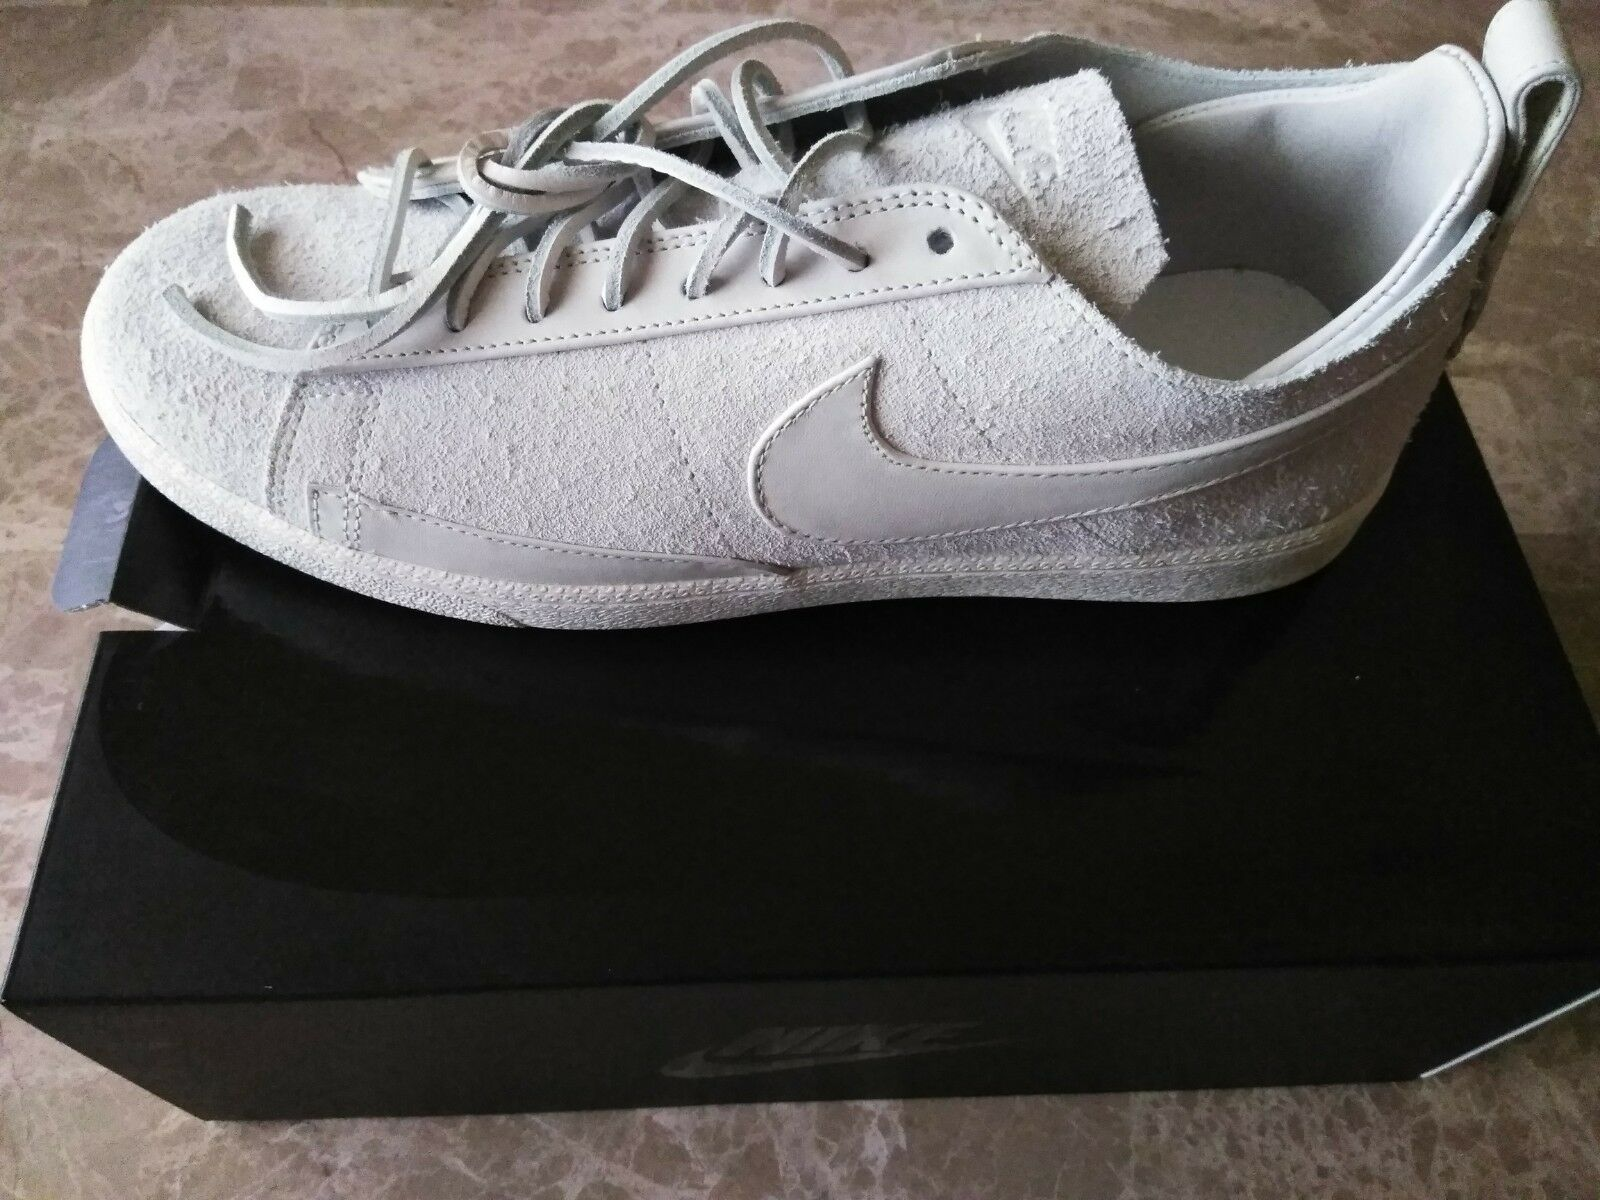 Nike Lab Blazer Low CS TC Tech Craft Mens 10.5 New With Box Seasonal clearance sale